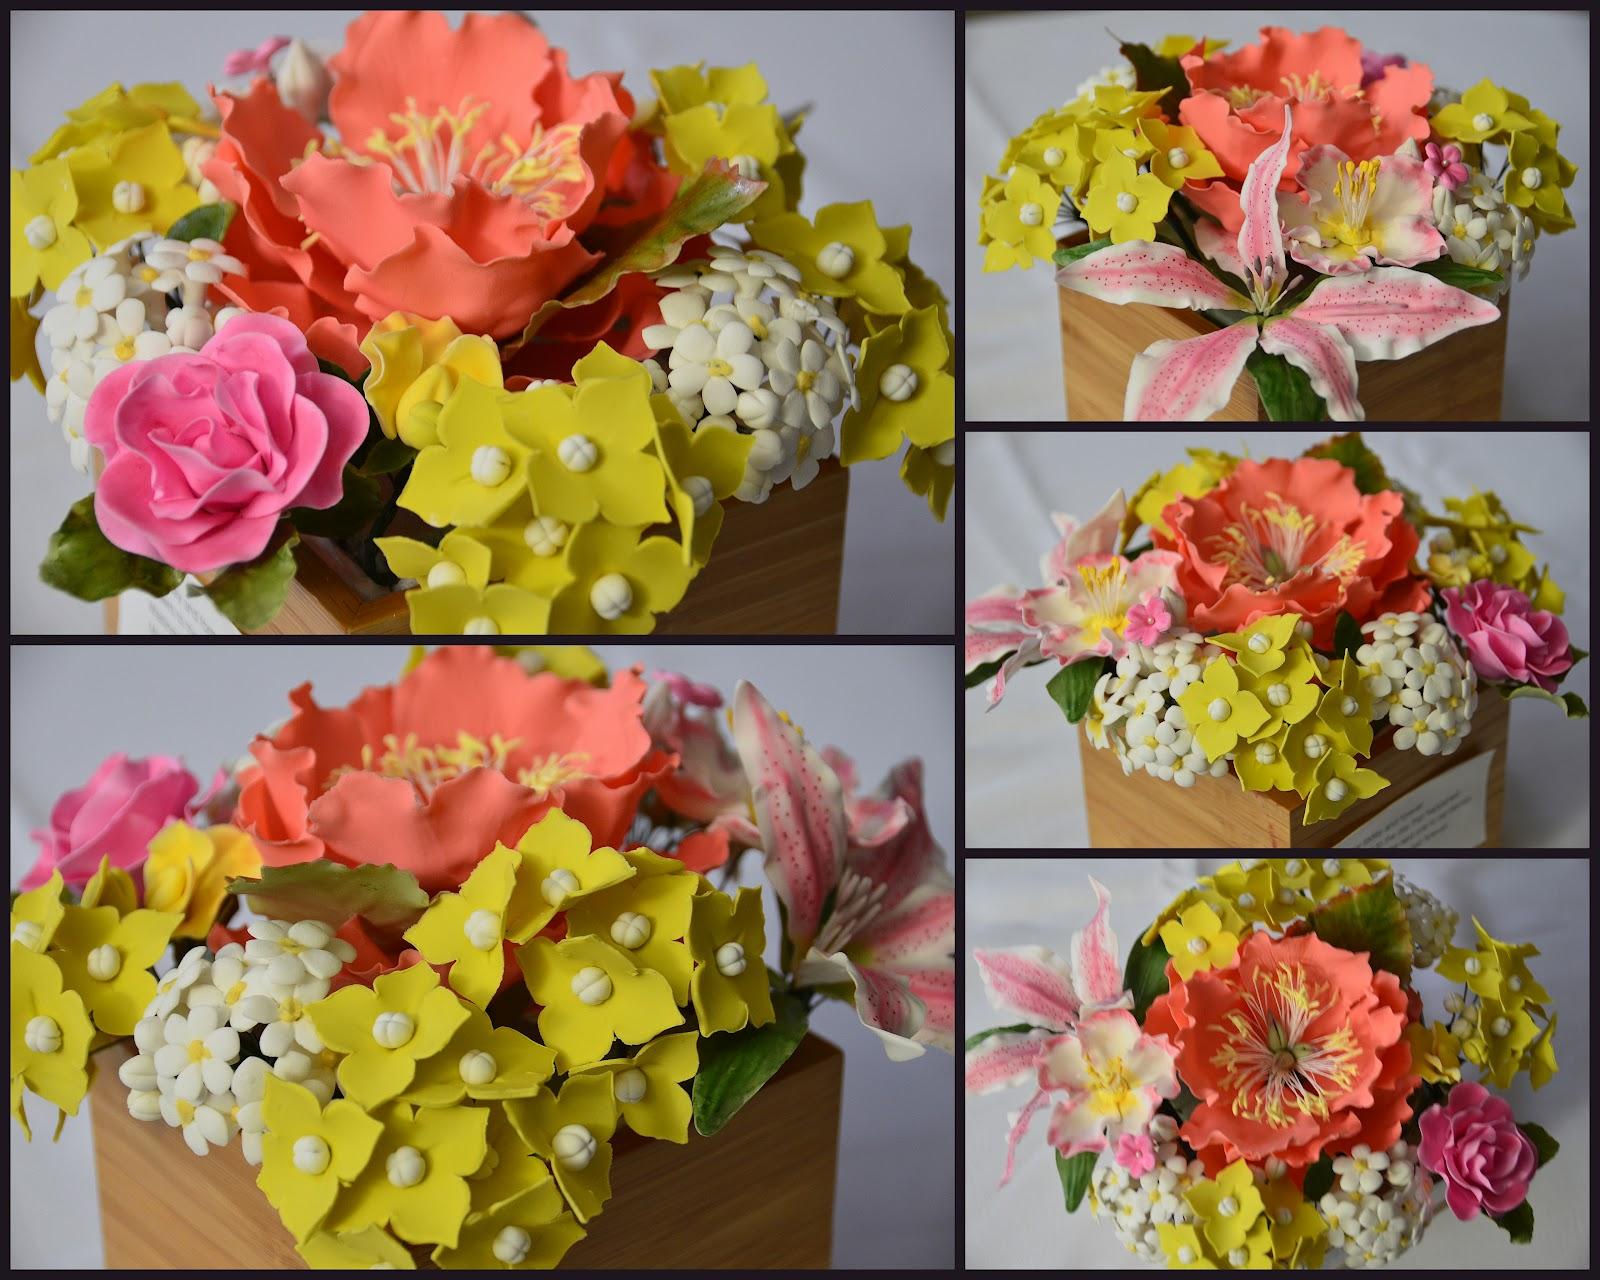 Pin Labels Gumpaste Flower Wedding Cake on Pinterest